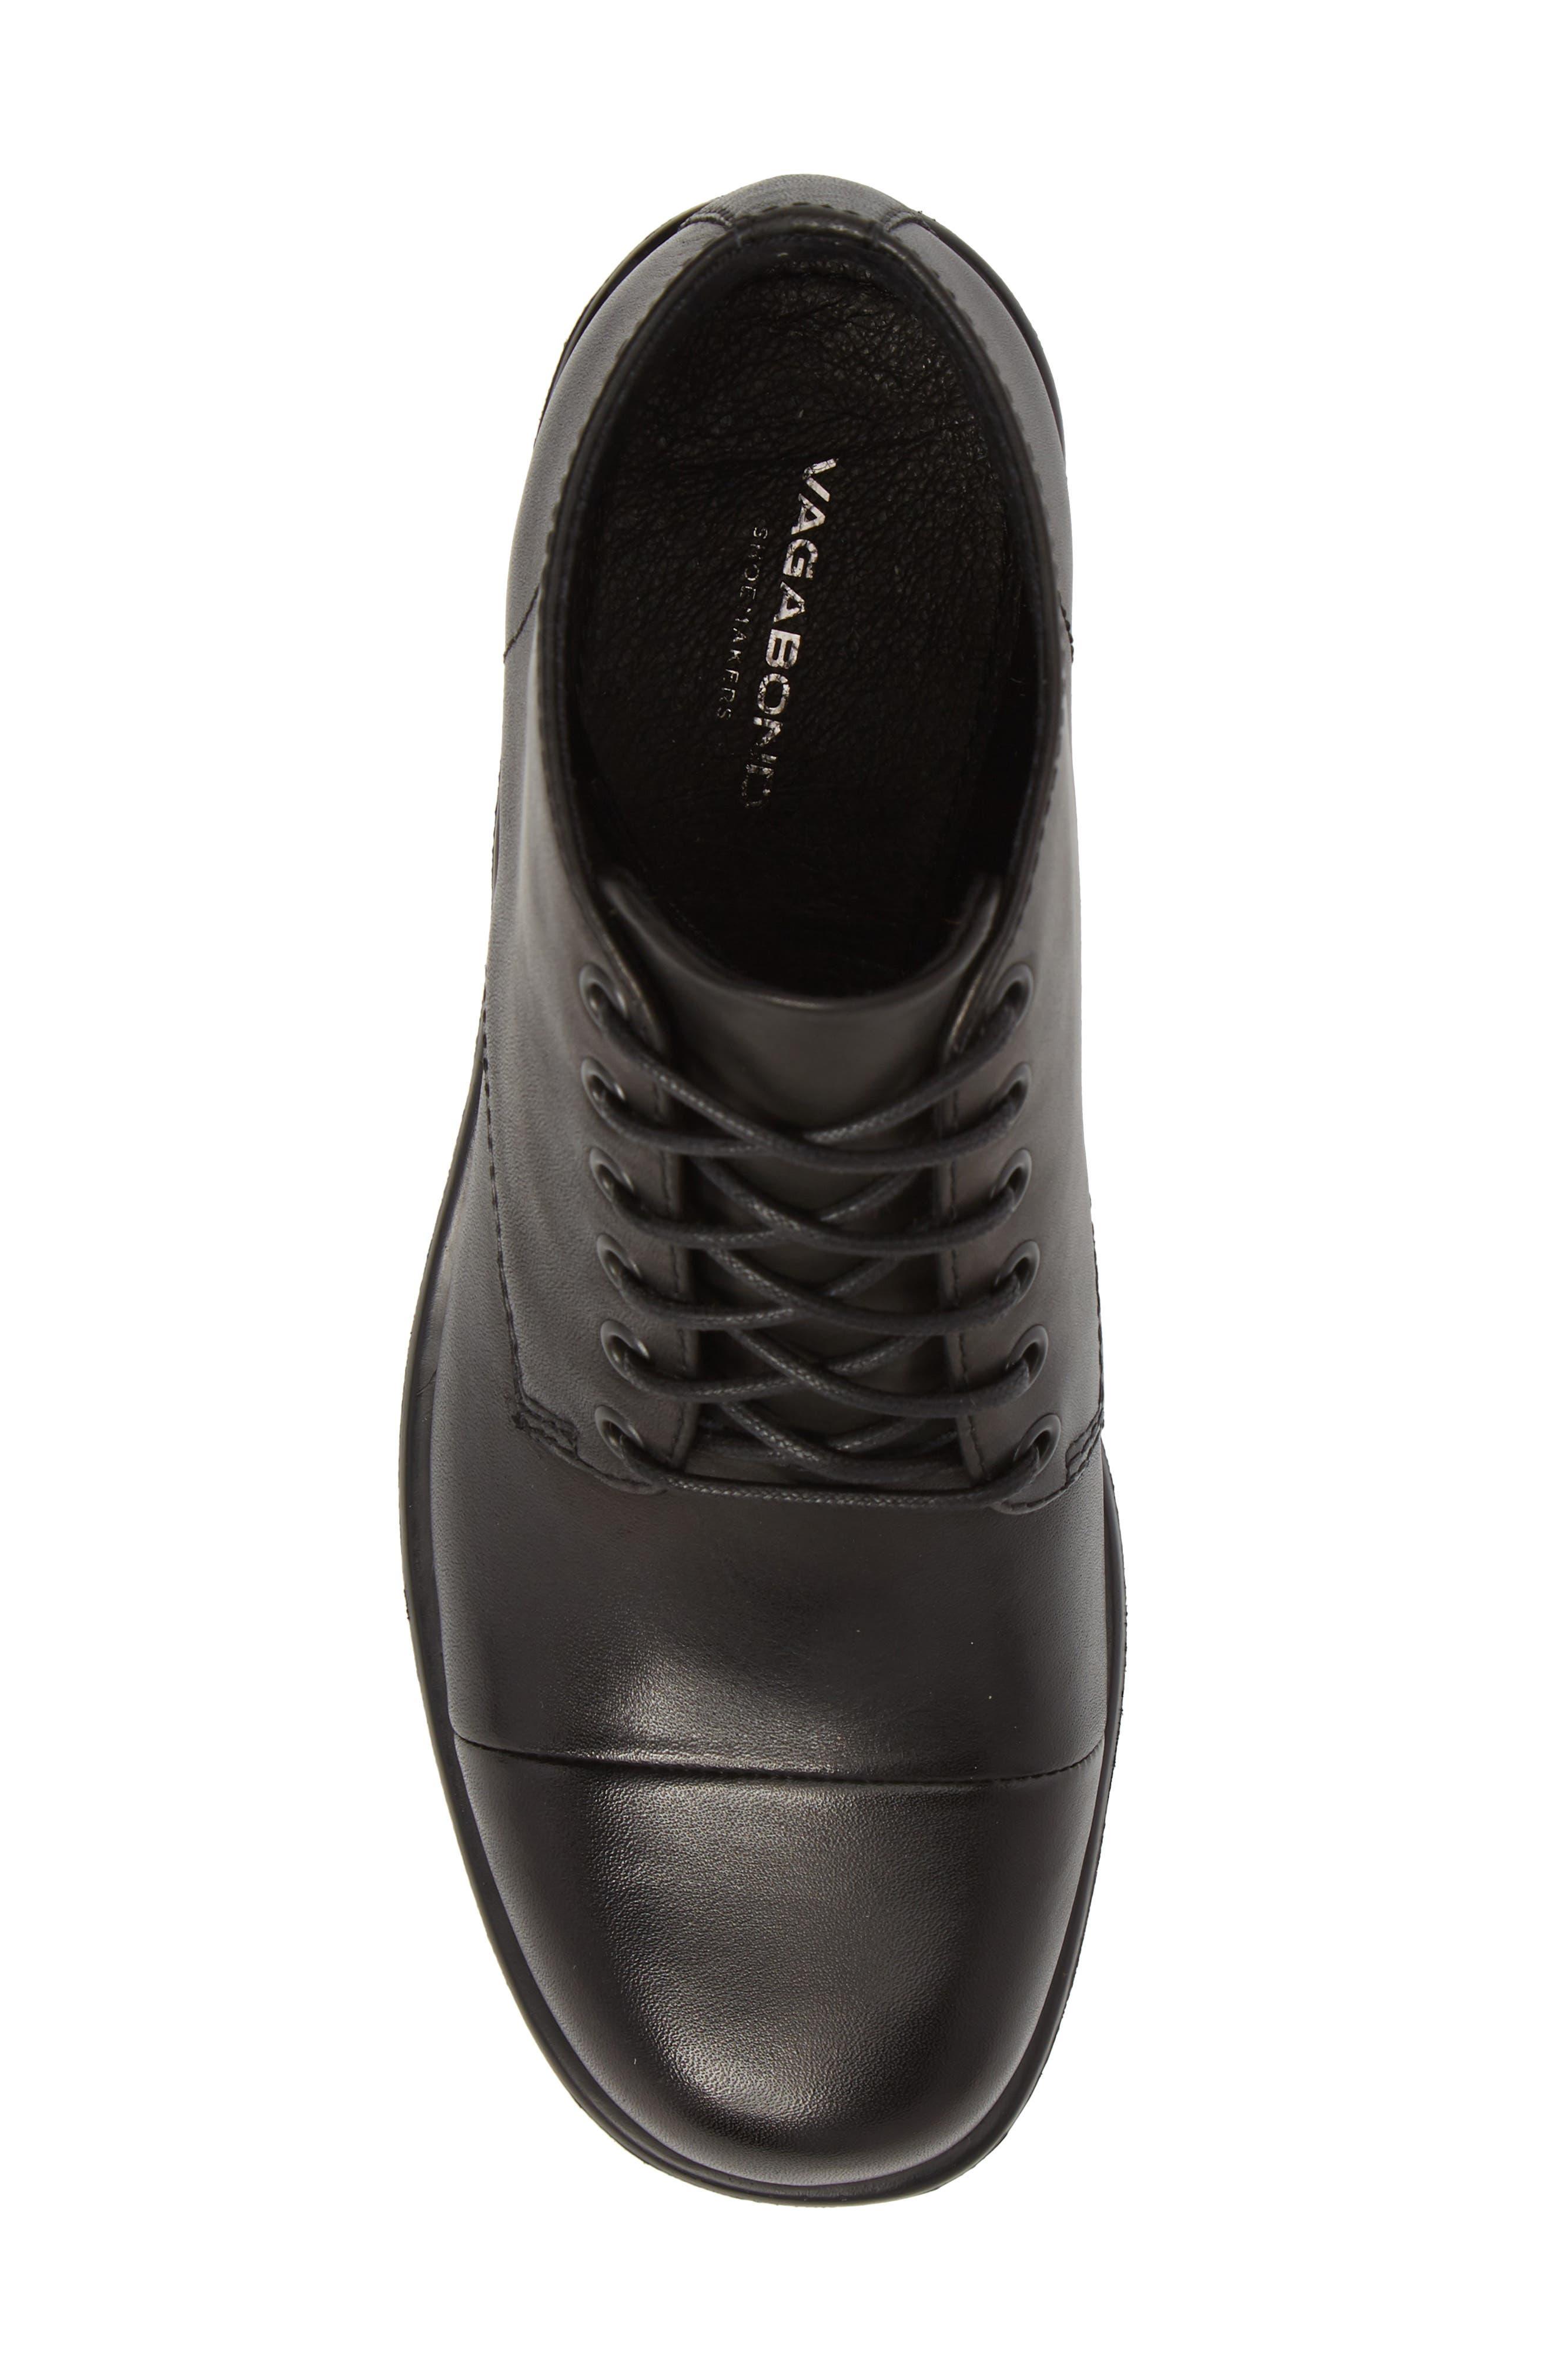 VAGABOND,                             Shoemakers Dioon Cap Toe Bootie,                             Alternate thumbnail 5, color,                             BLACK LEATHER